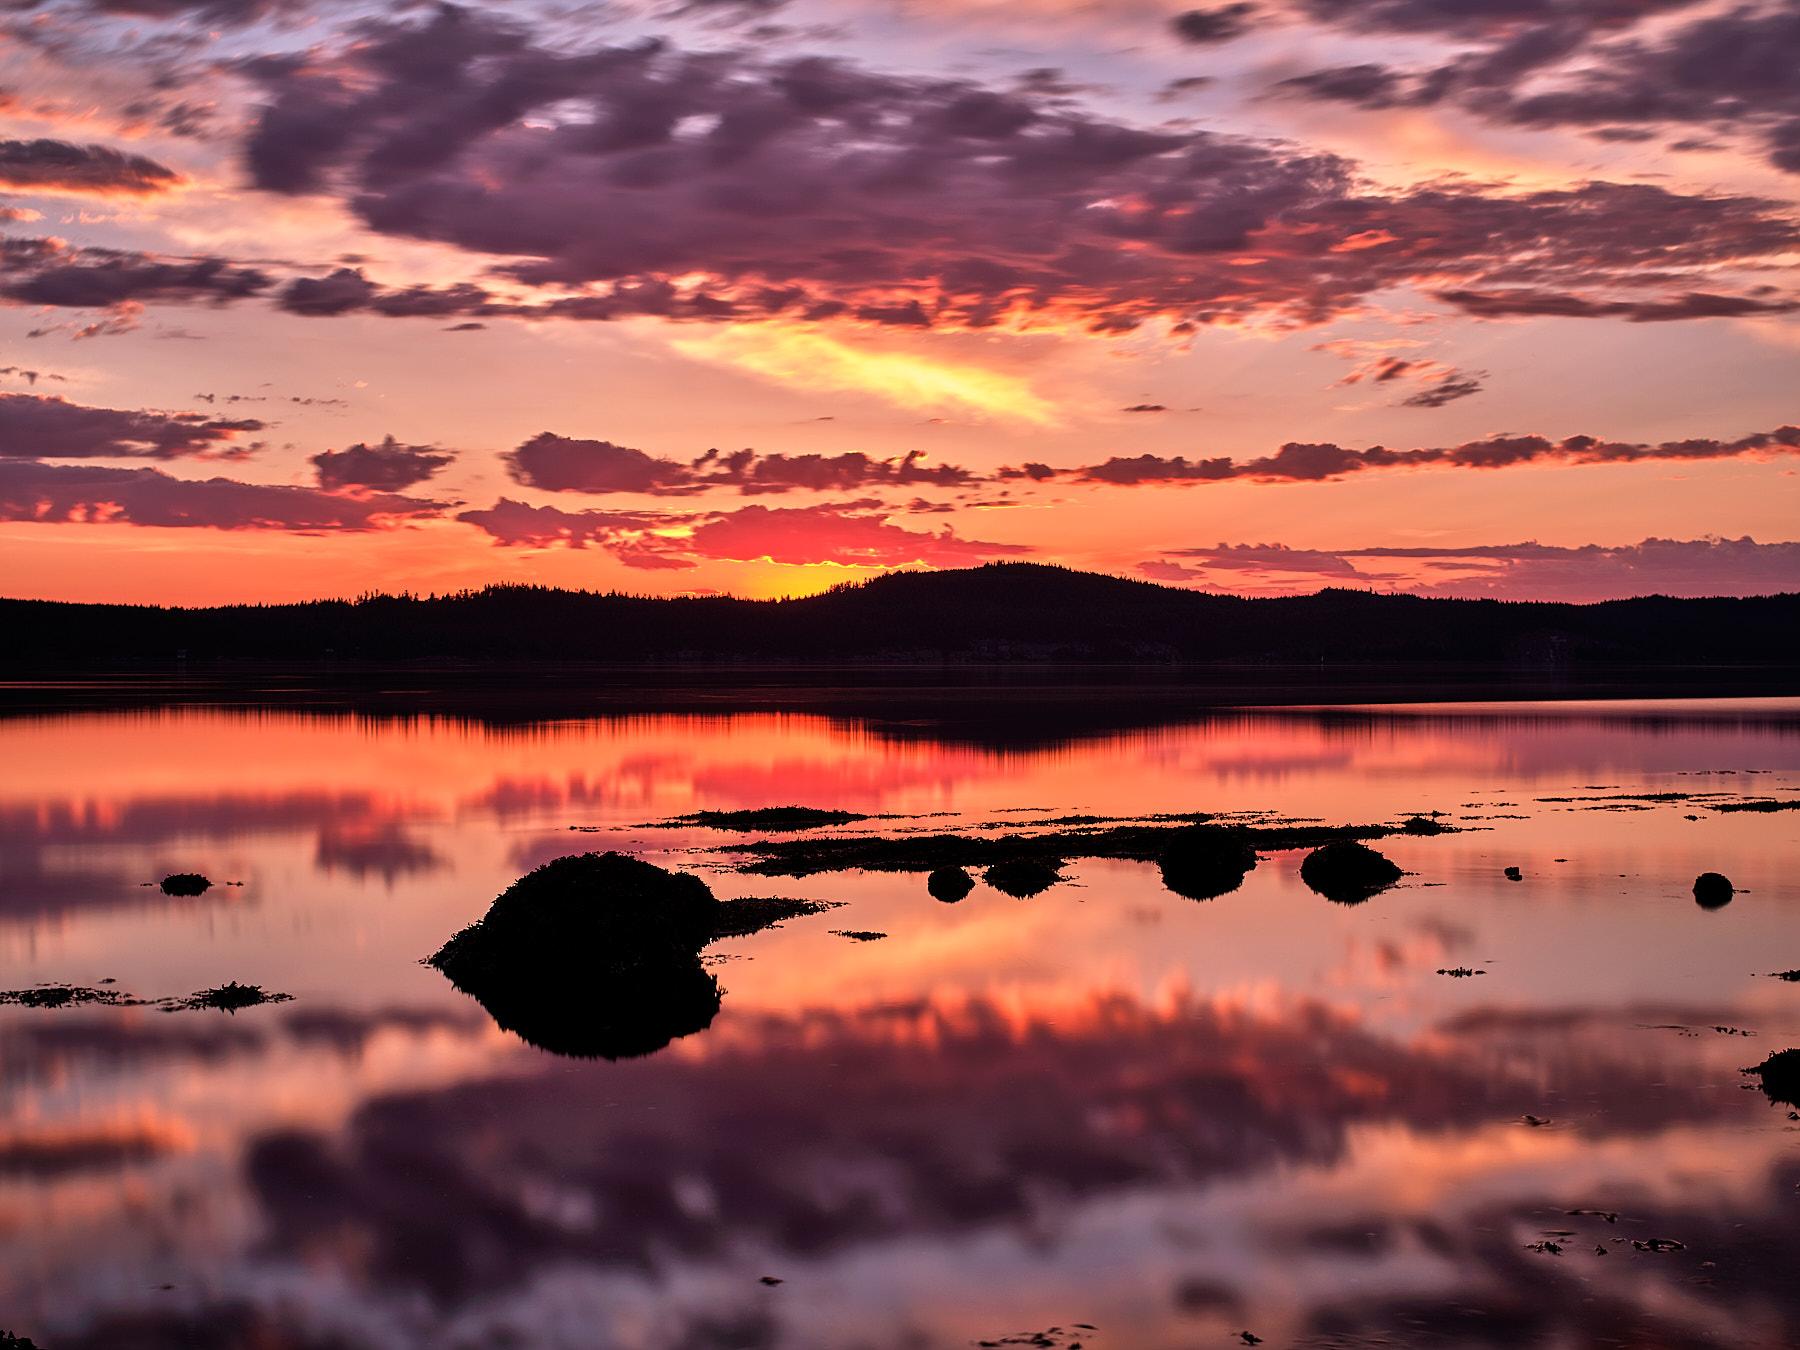 Galiano island from Salt Spring Island ©johncameron.ca